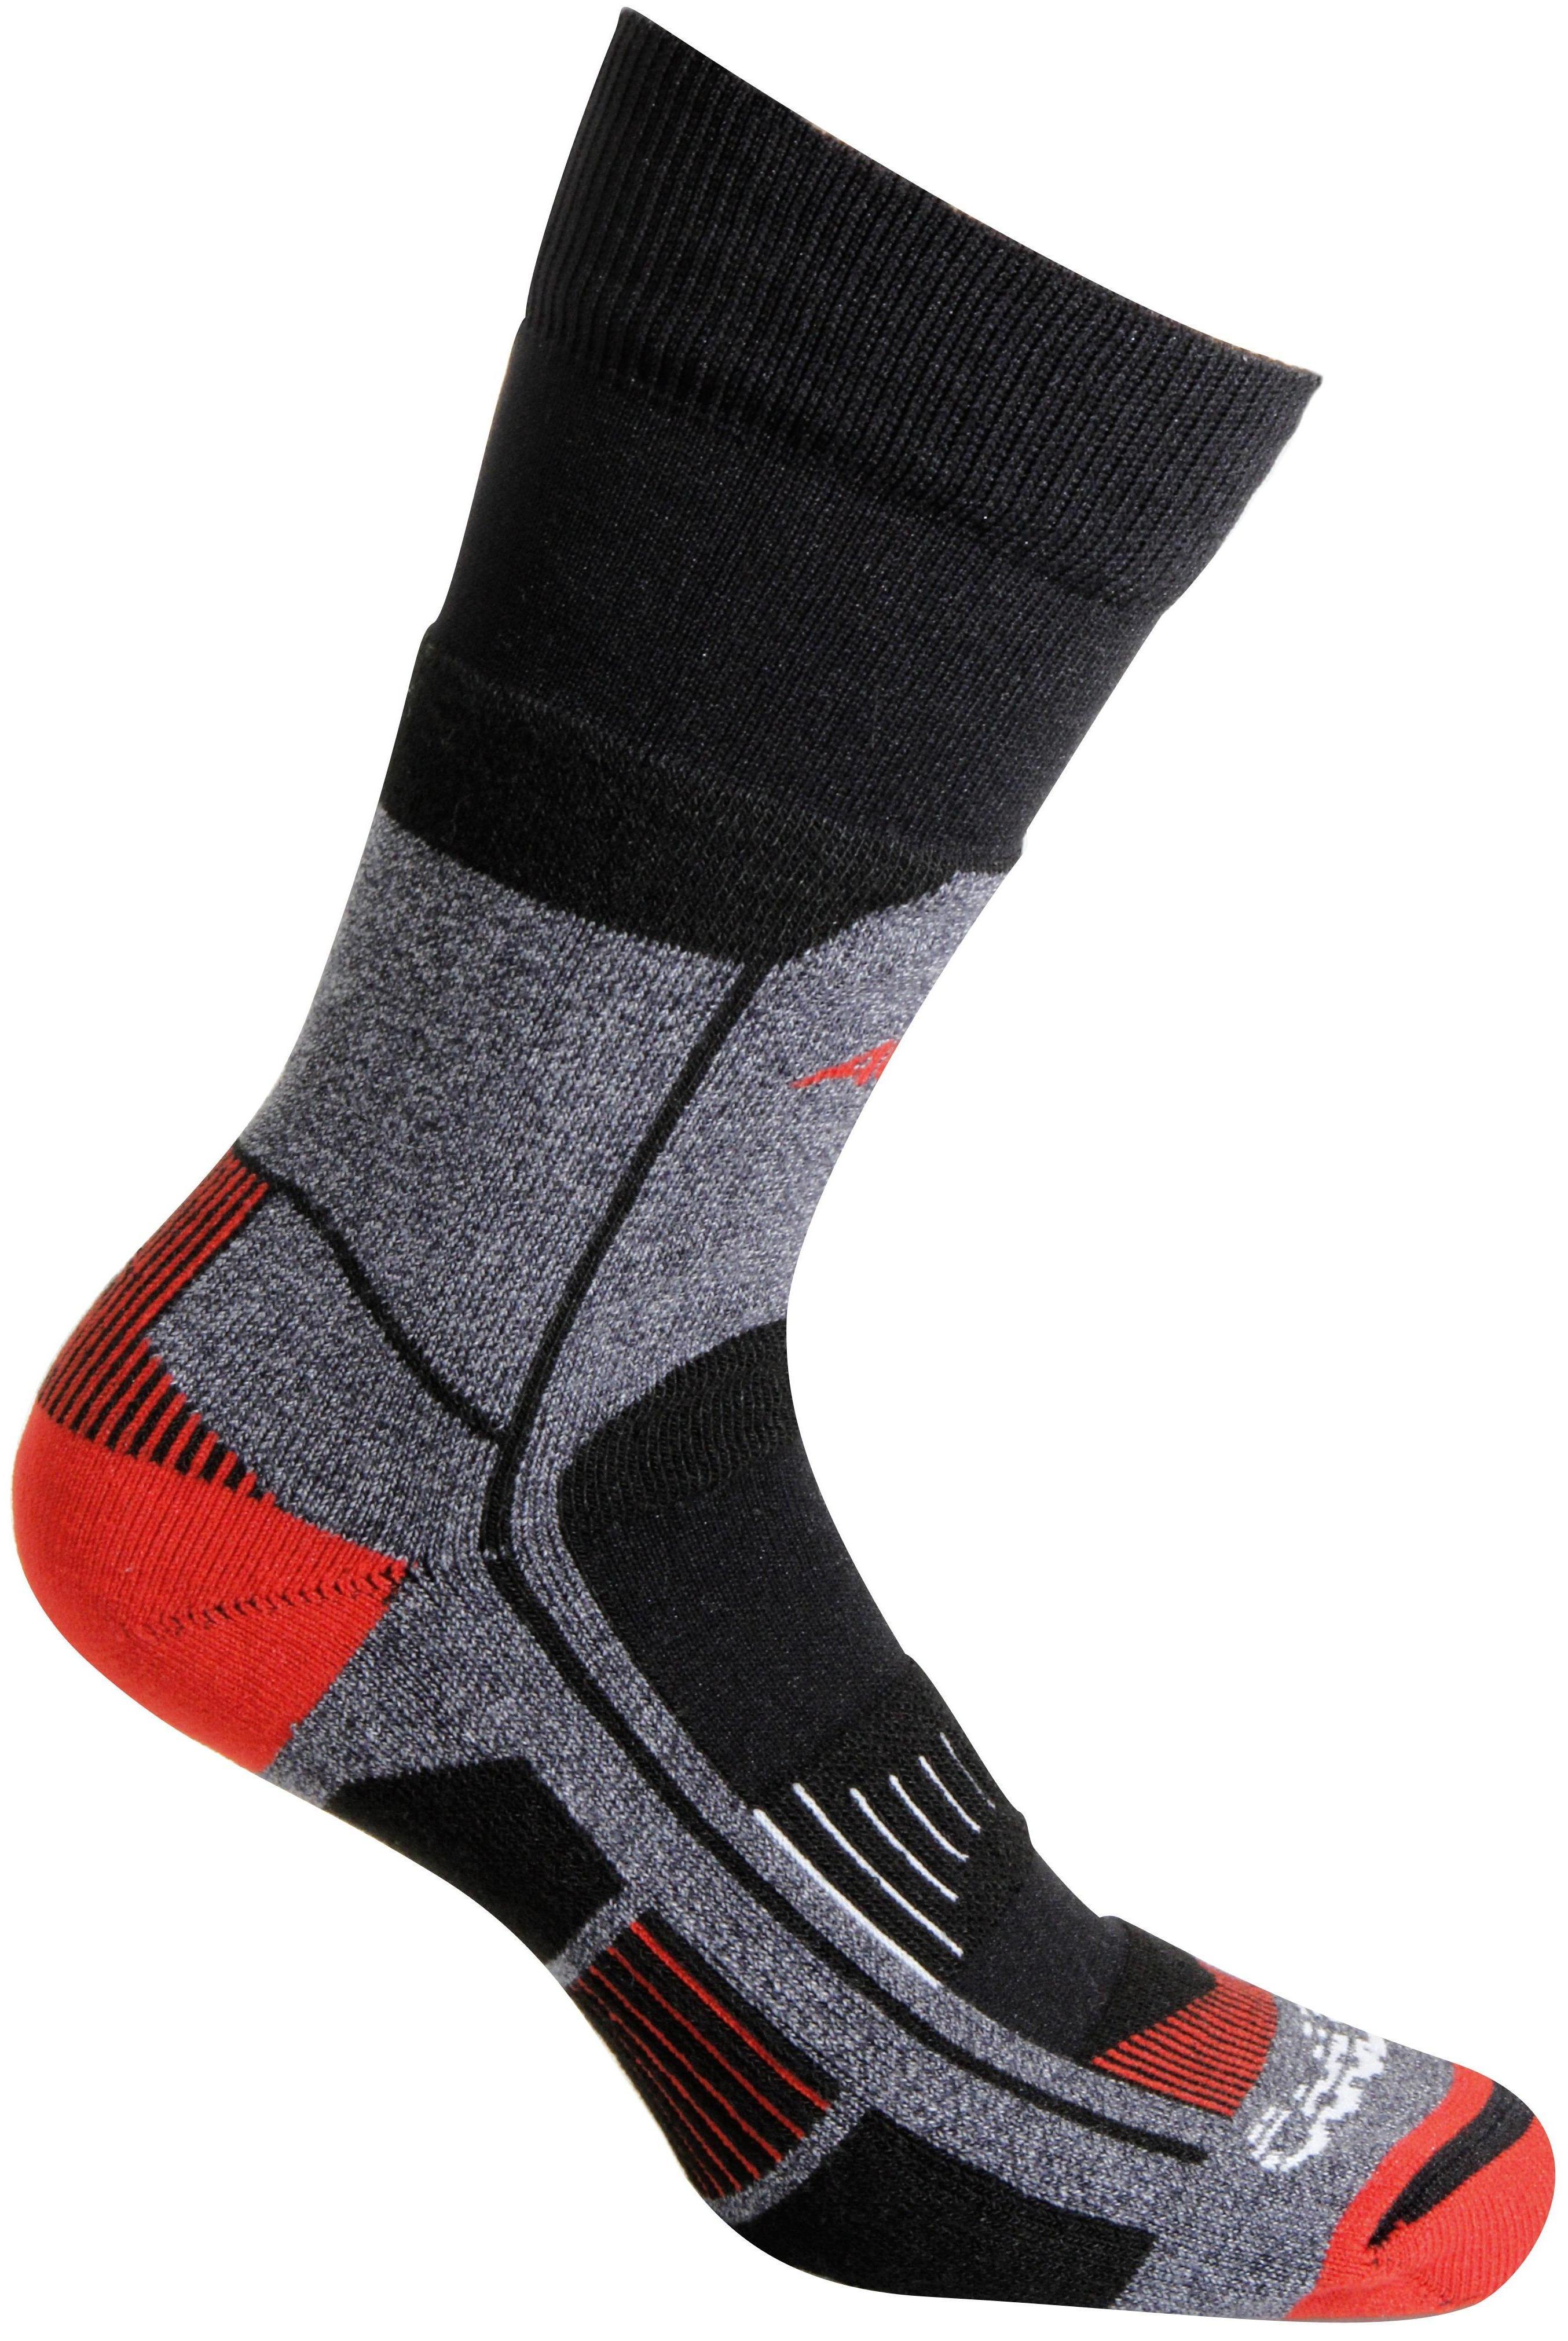 Носки Accapi Socks Trekking Ultralight - Short, black/red, 42-44 EU